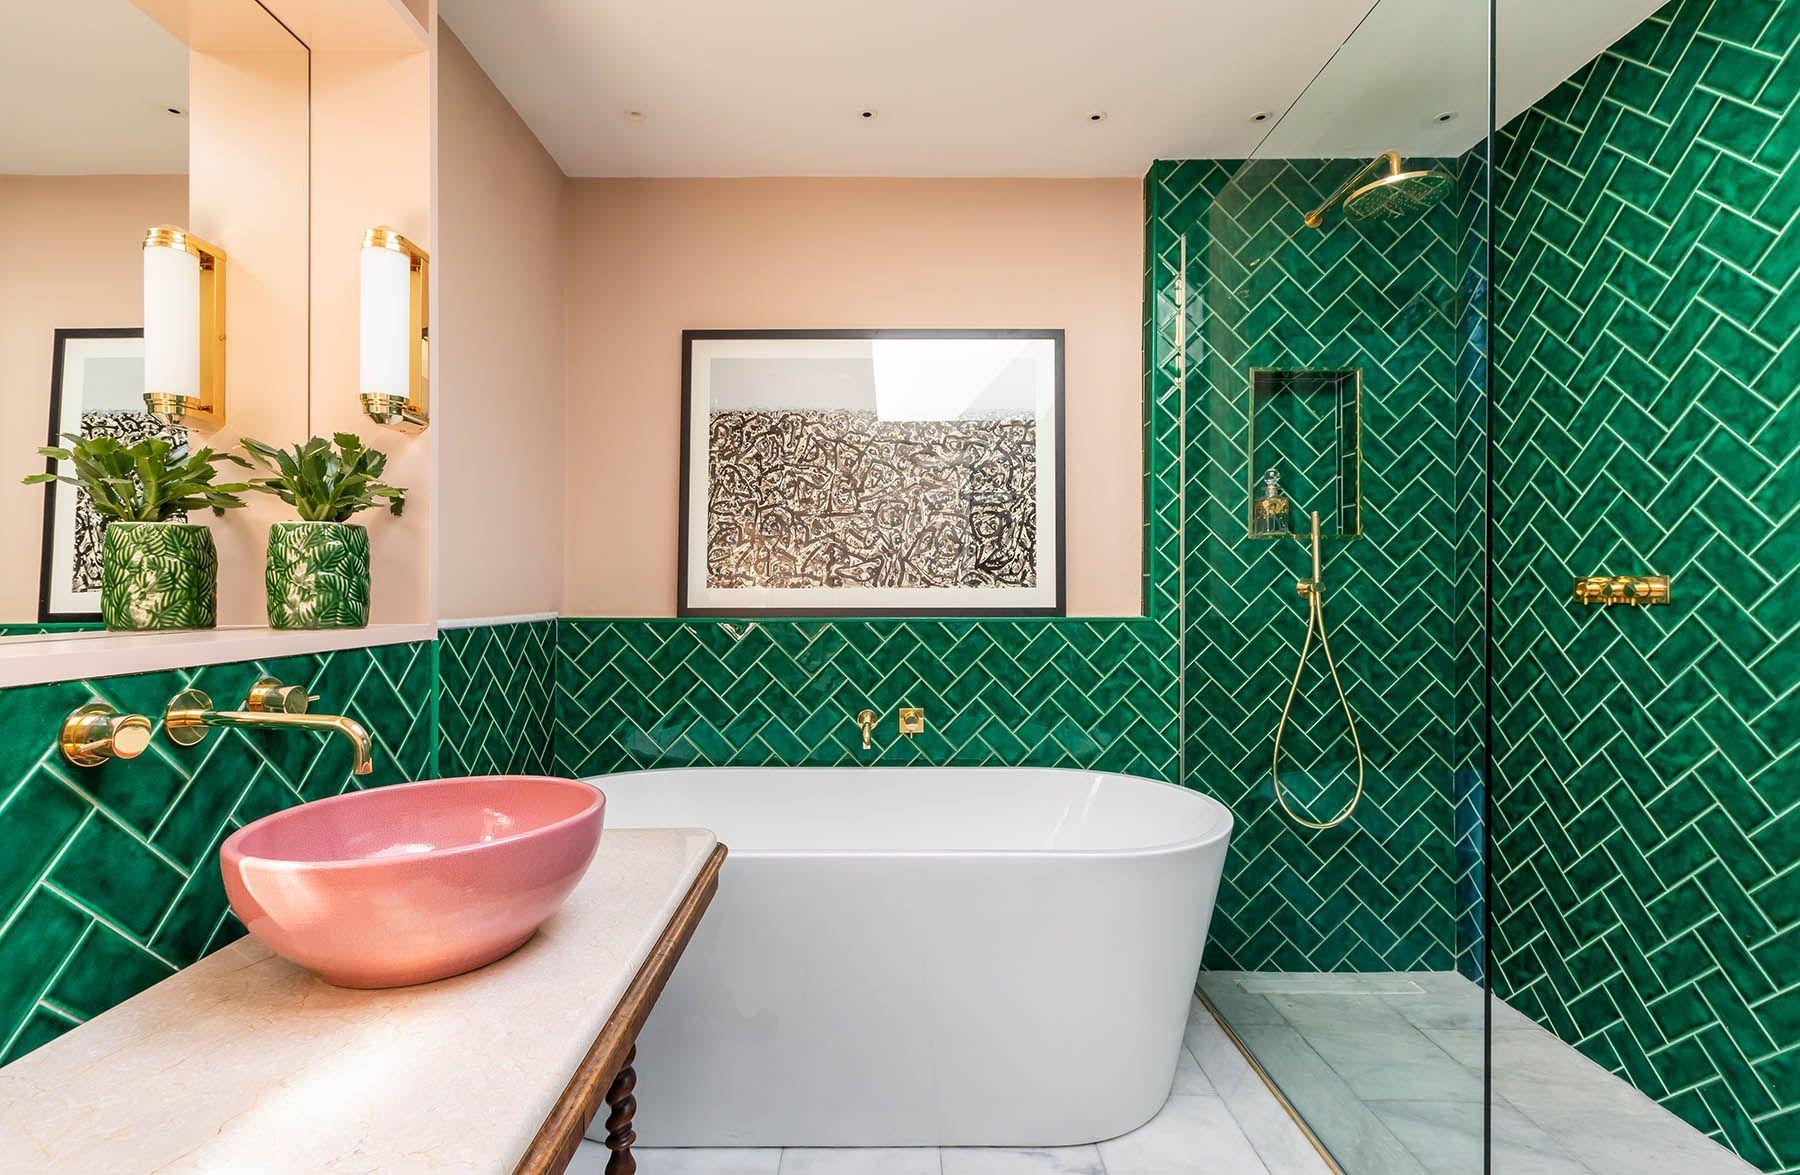 Guest Bathroom Emerald Green Metro Tiles Plaster Pink Walls Marble Floor Pink Ceramic Sinks Bathroom Interior Design Bathroom Interior Apartment Interior